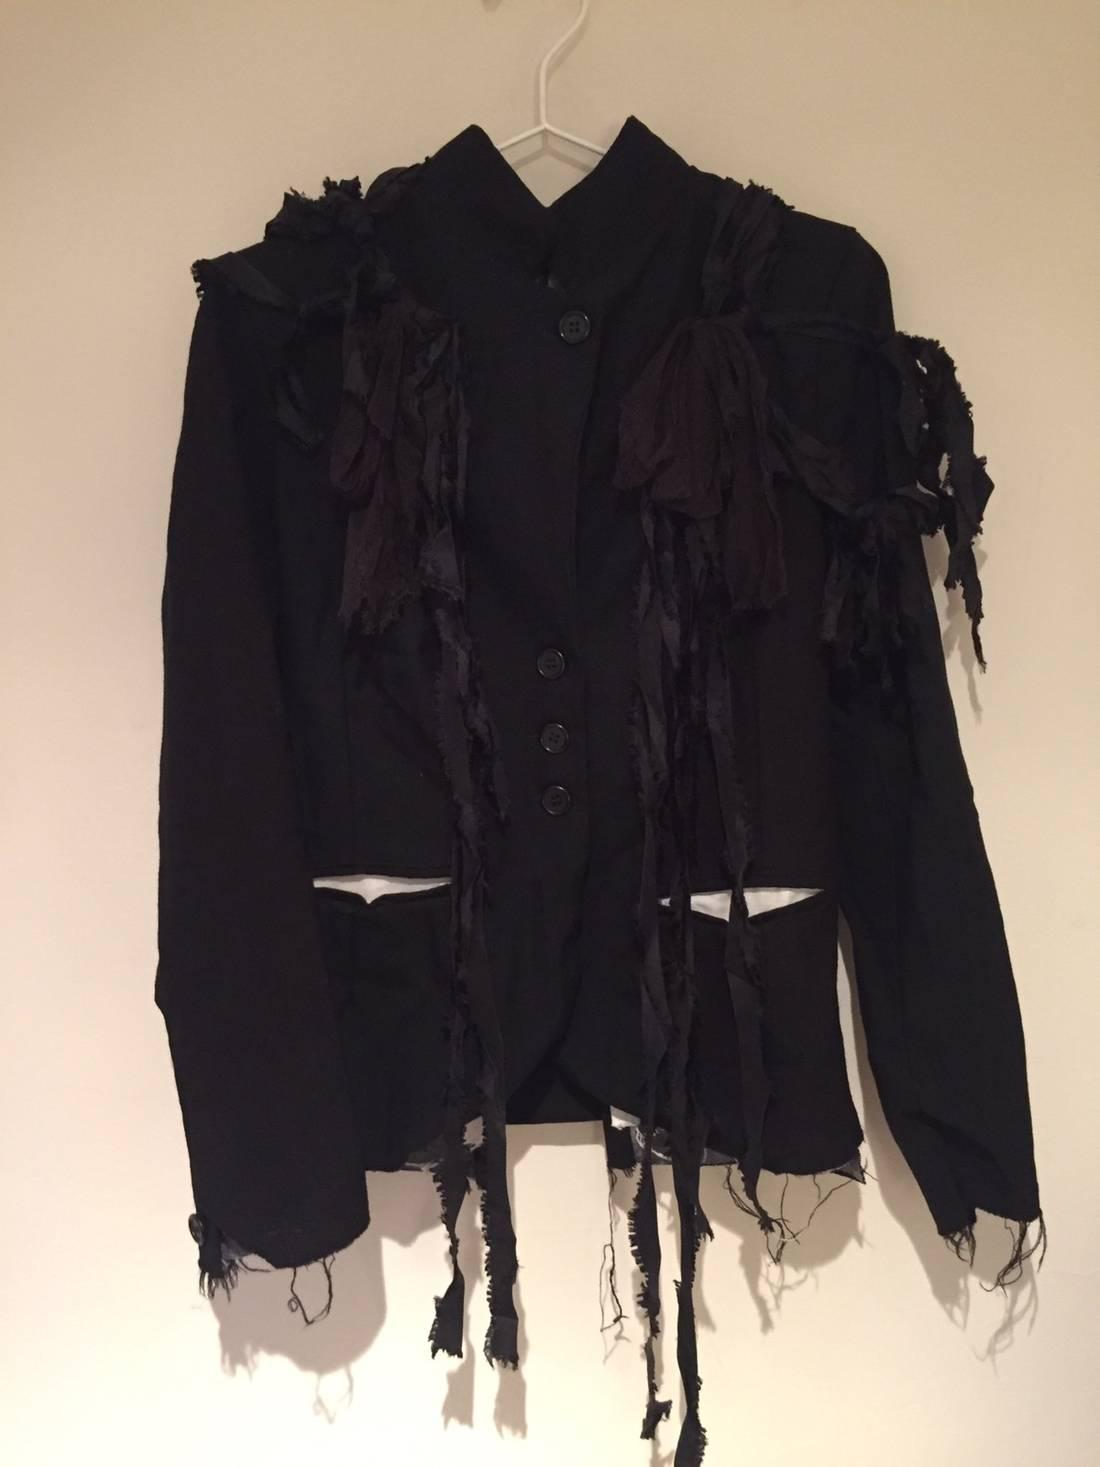 COATS & JACKETS - Jackets Paris Frou Frou Huge Surprise Cheap Price Aberdeen DMrx7kfl